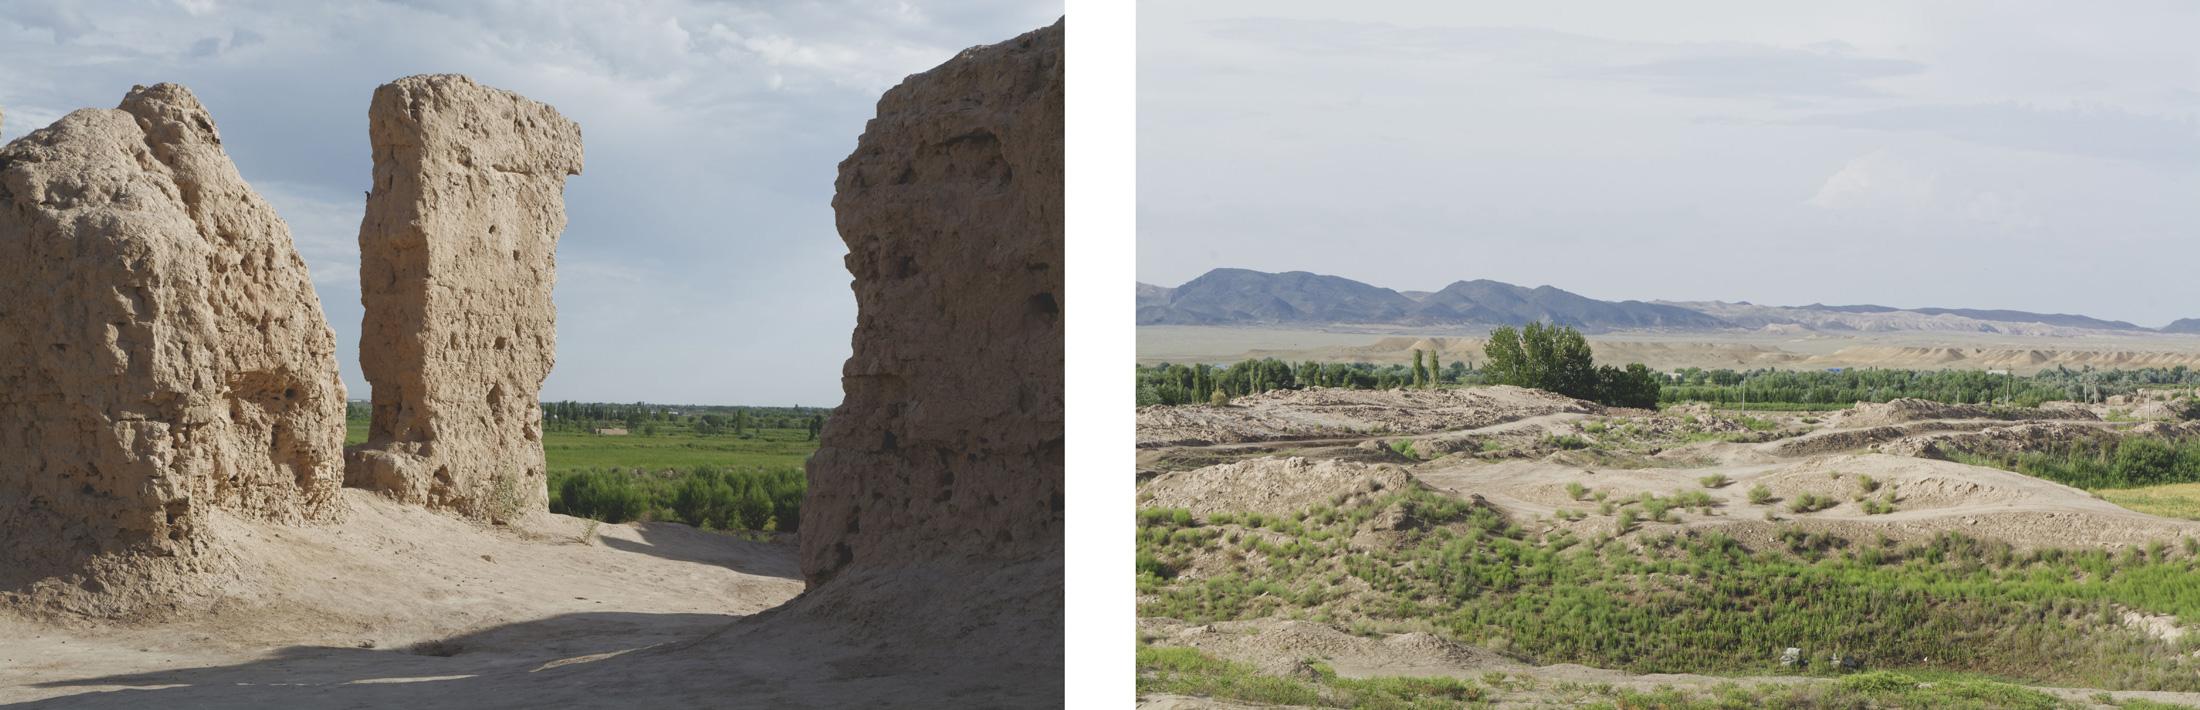 Kyzyl Kala Karakalpakstan